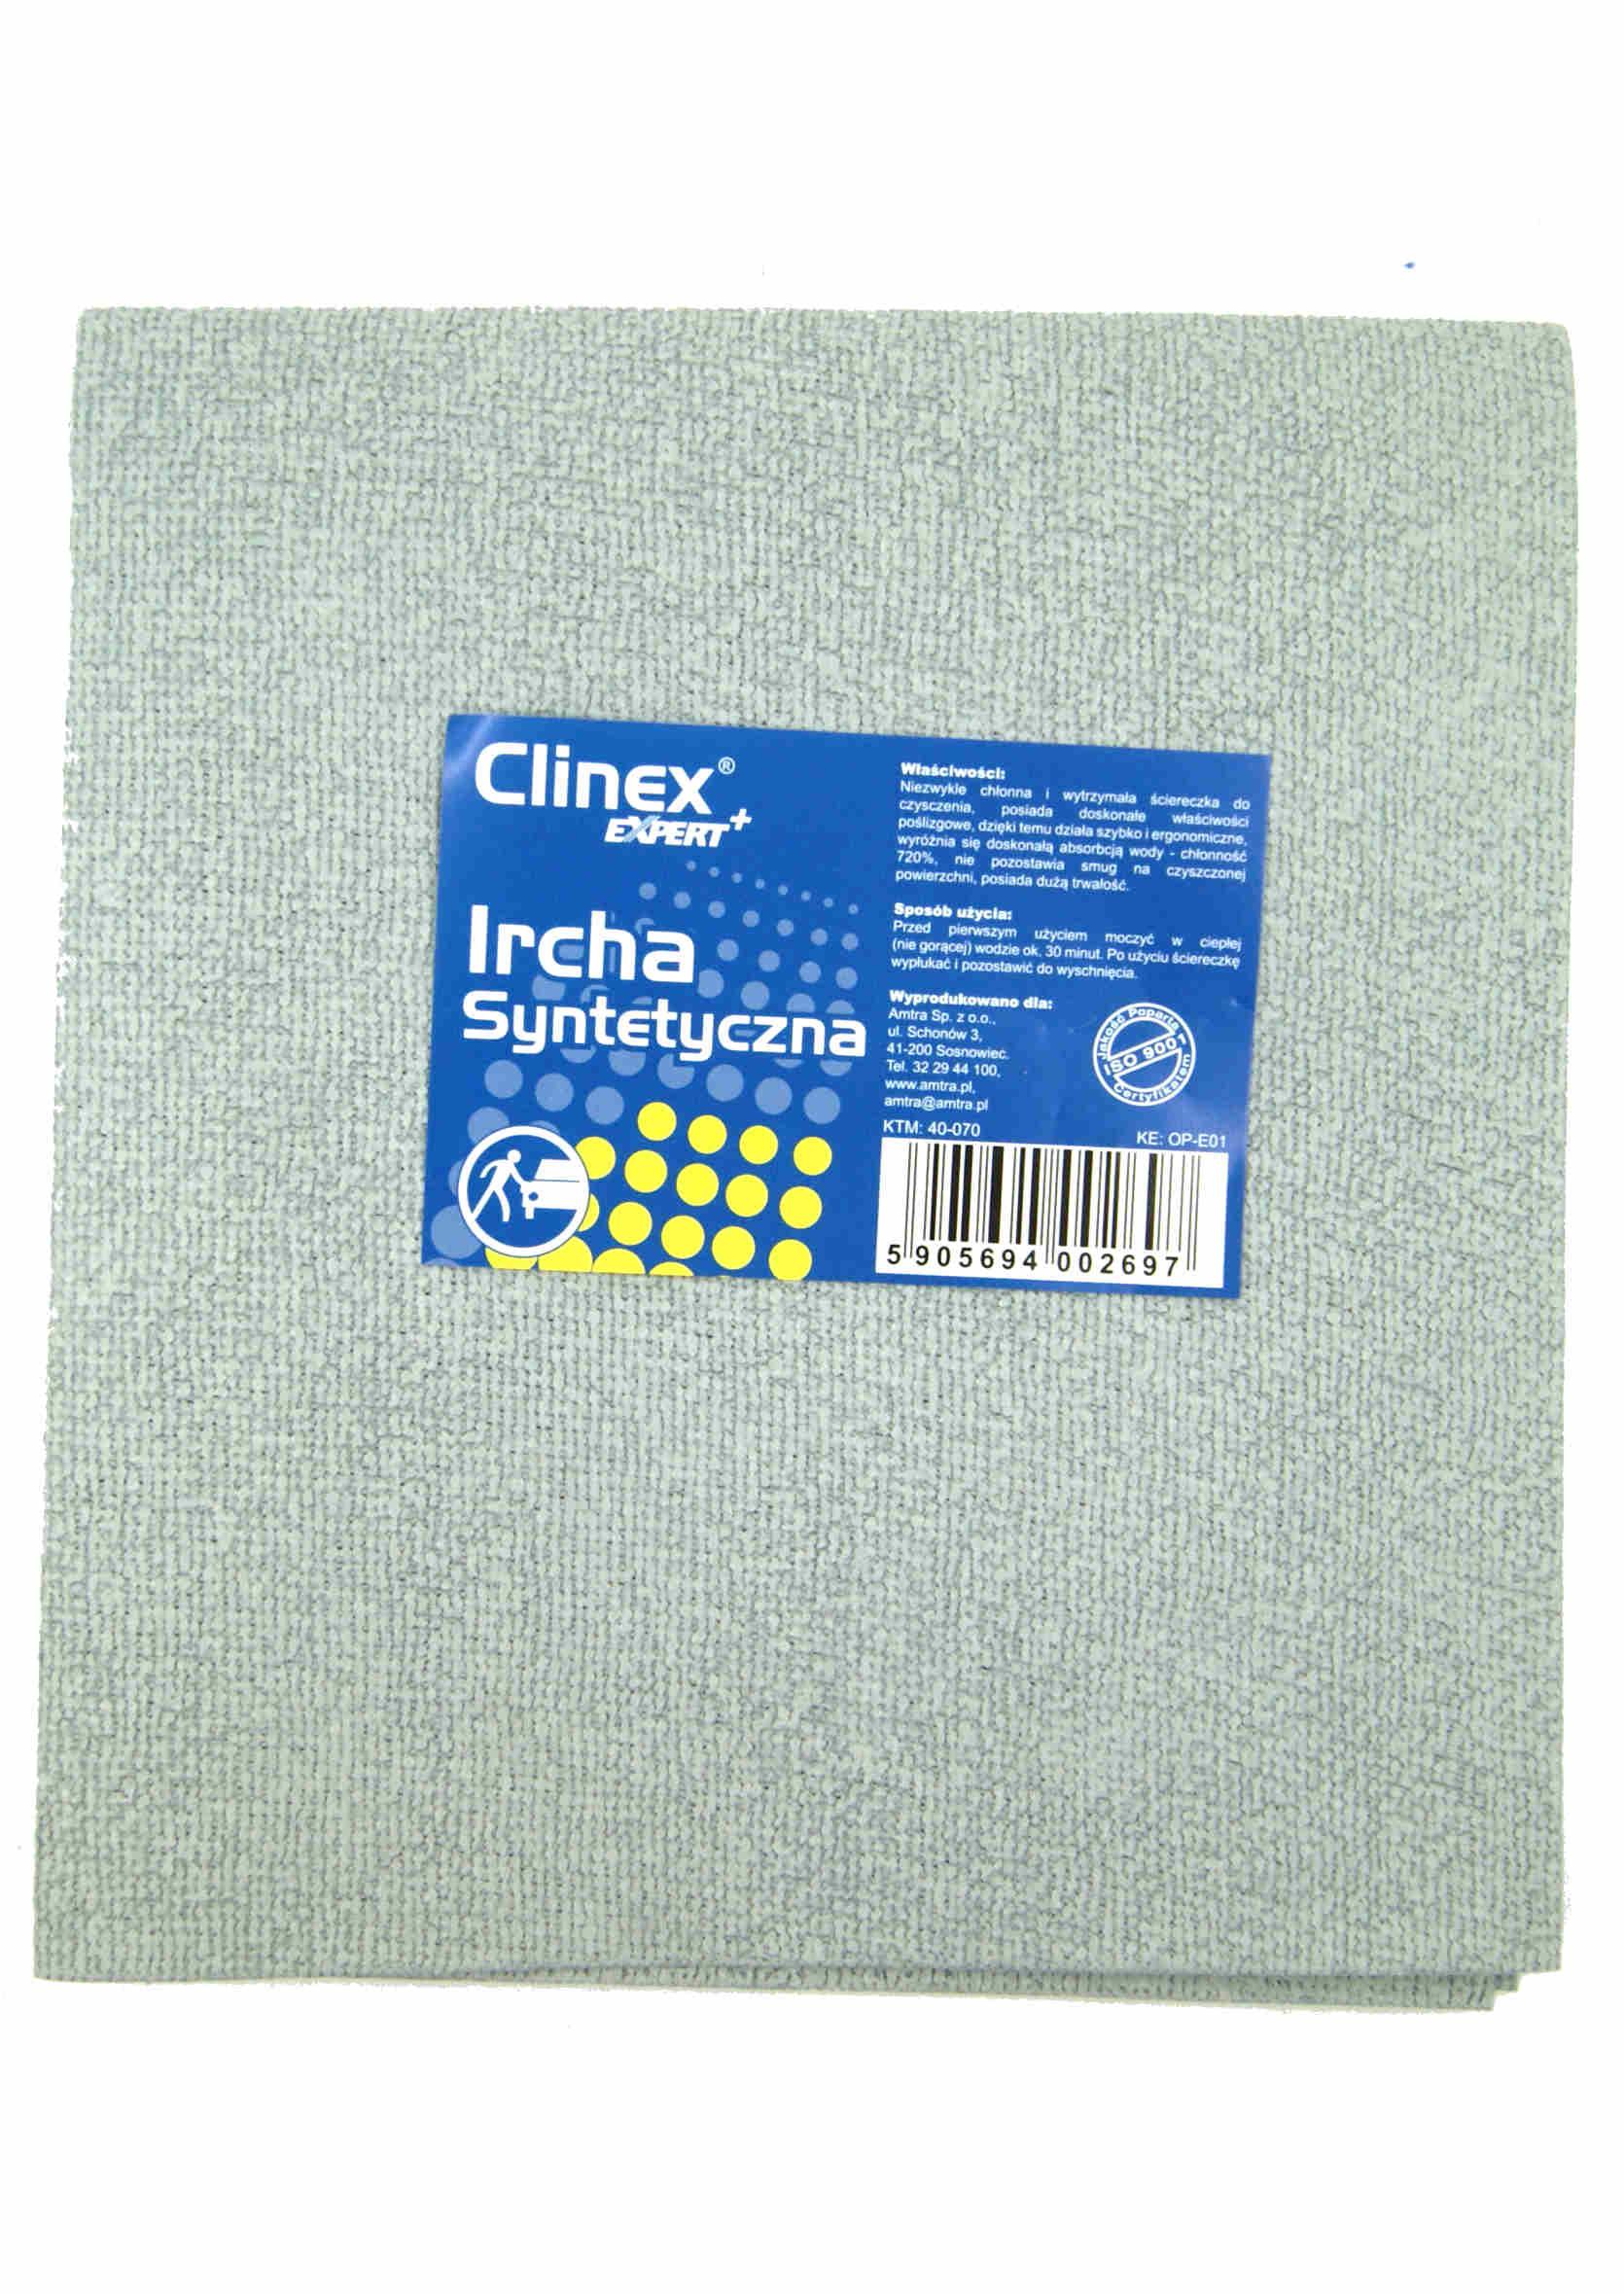 Clinex Expert+ Ircha Syntetyczna 53x43cm